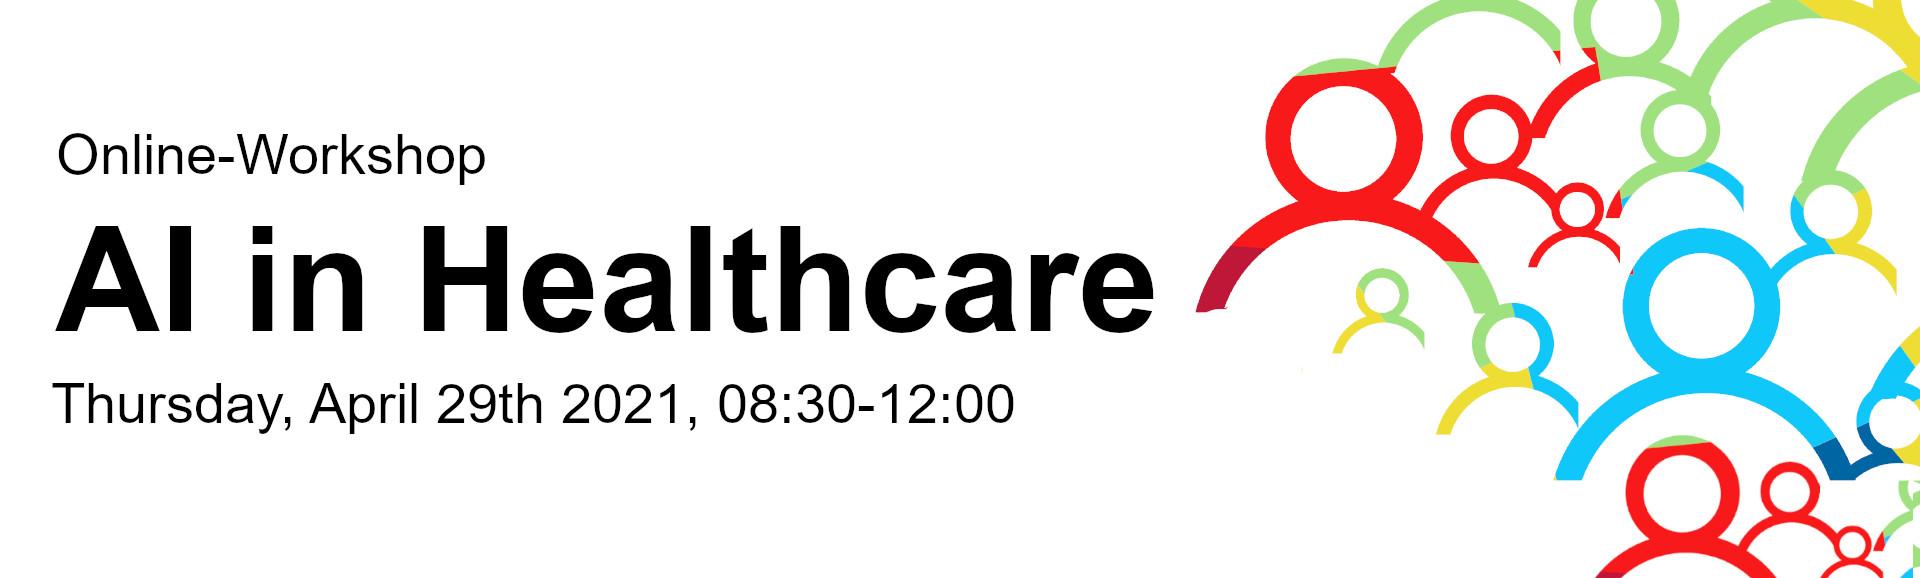 Online-Workshop: AI in Healthcare -Flyer